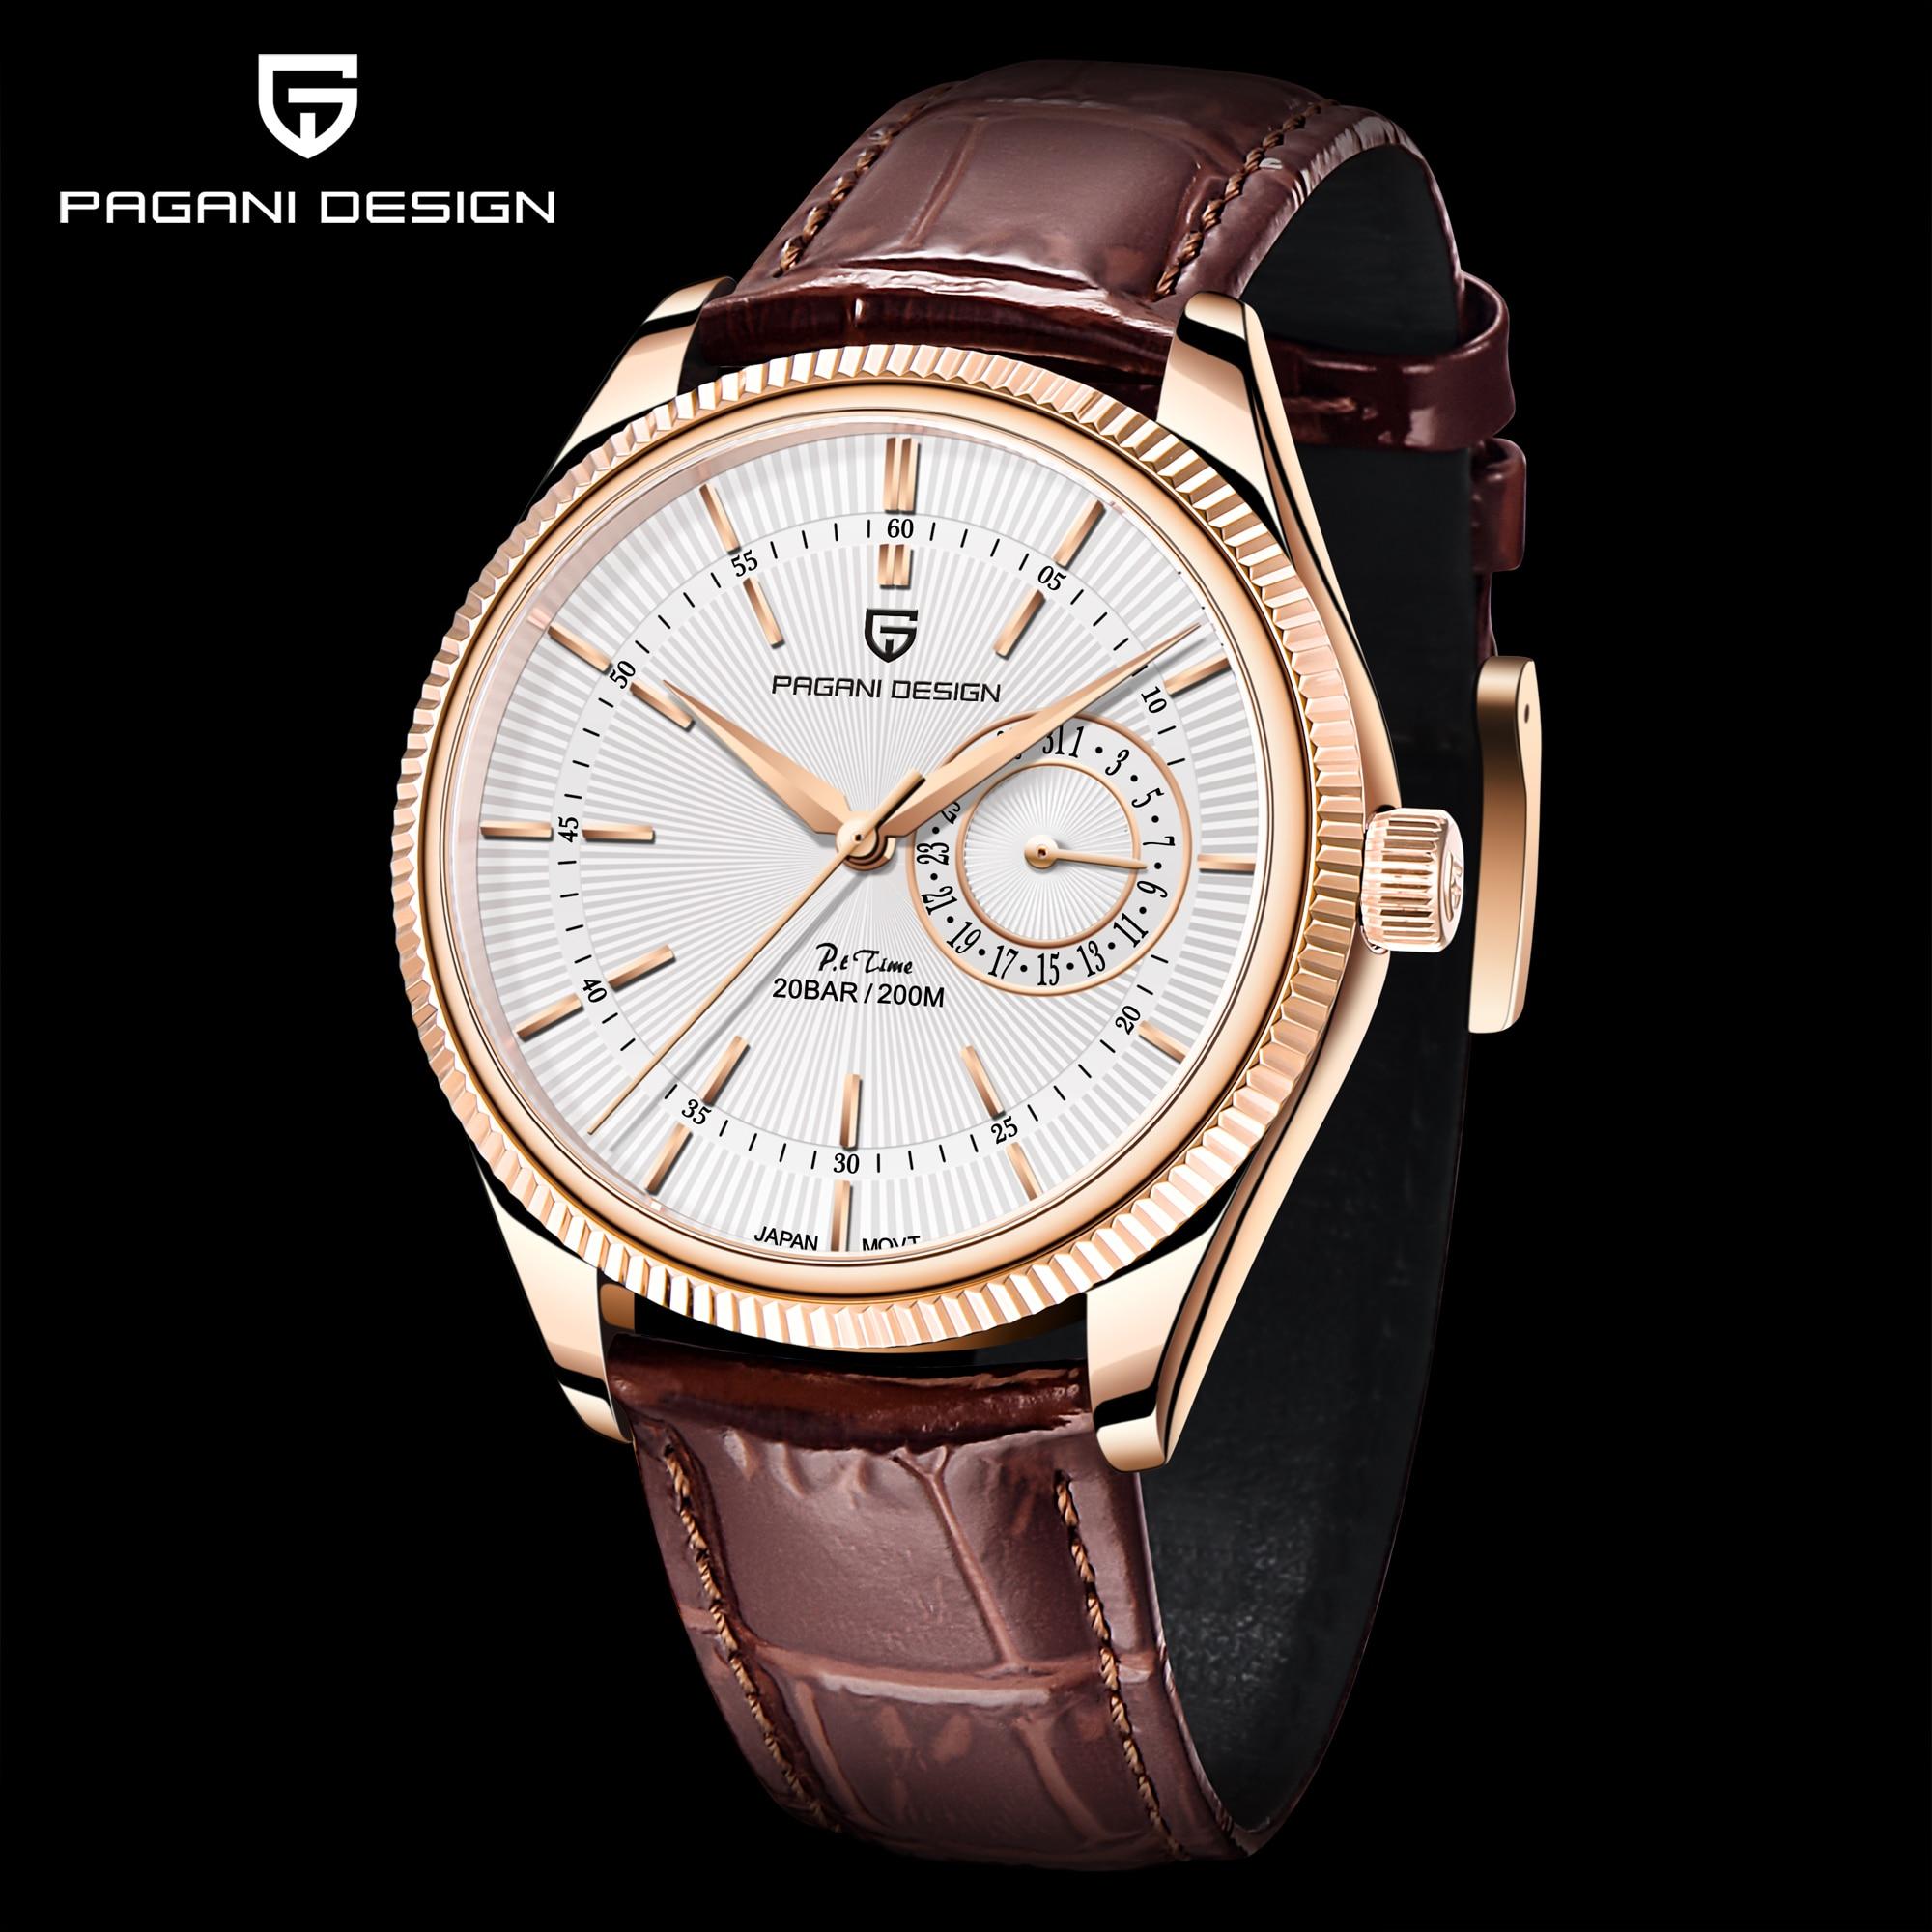 2021 New PAGANI Design Men's Quartz Watch Sapphire Japan VH65 Clock Men's Sports 200m Automatic Waterproof Watch Reloj Hombre